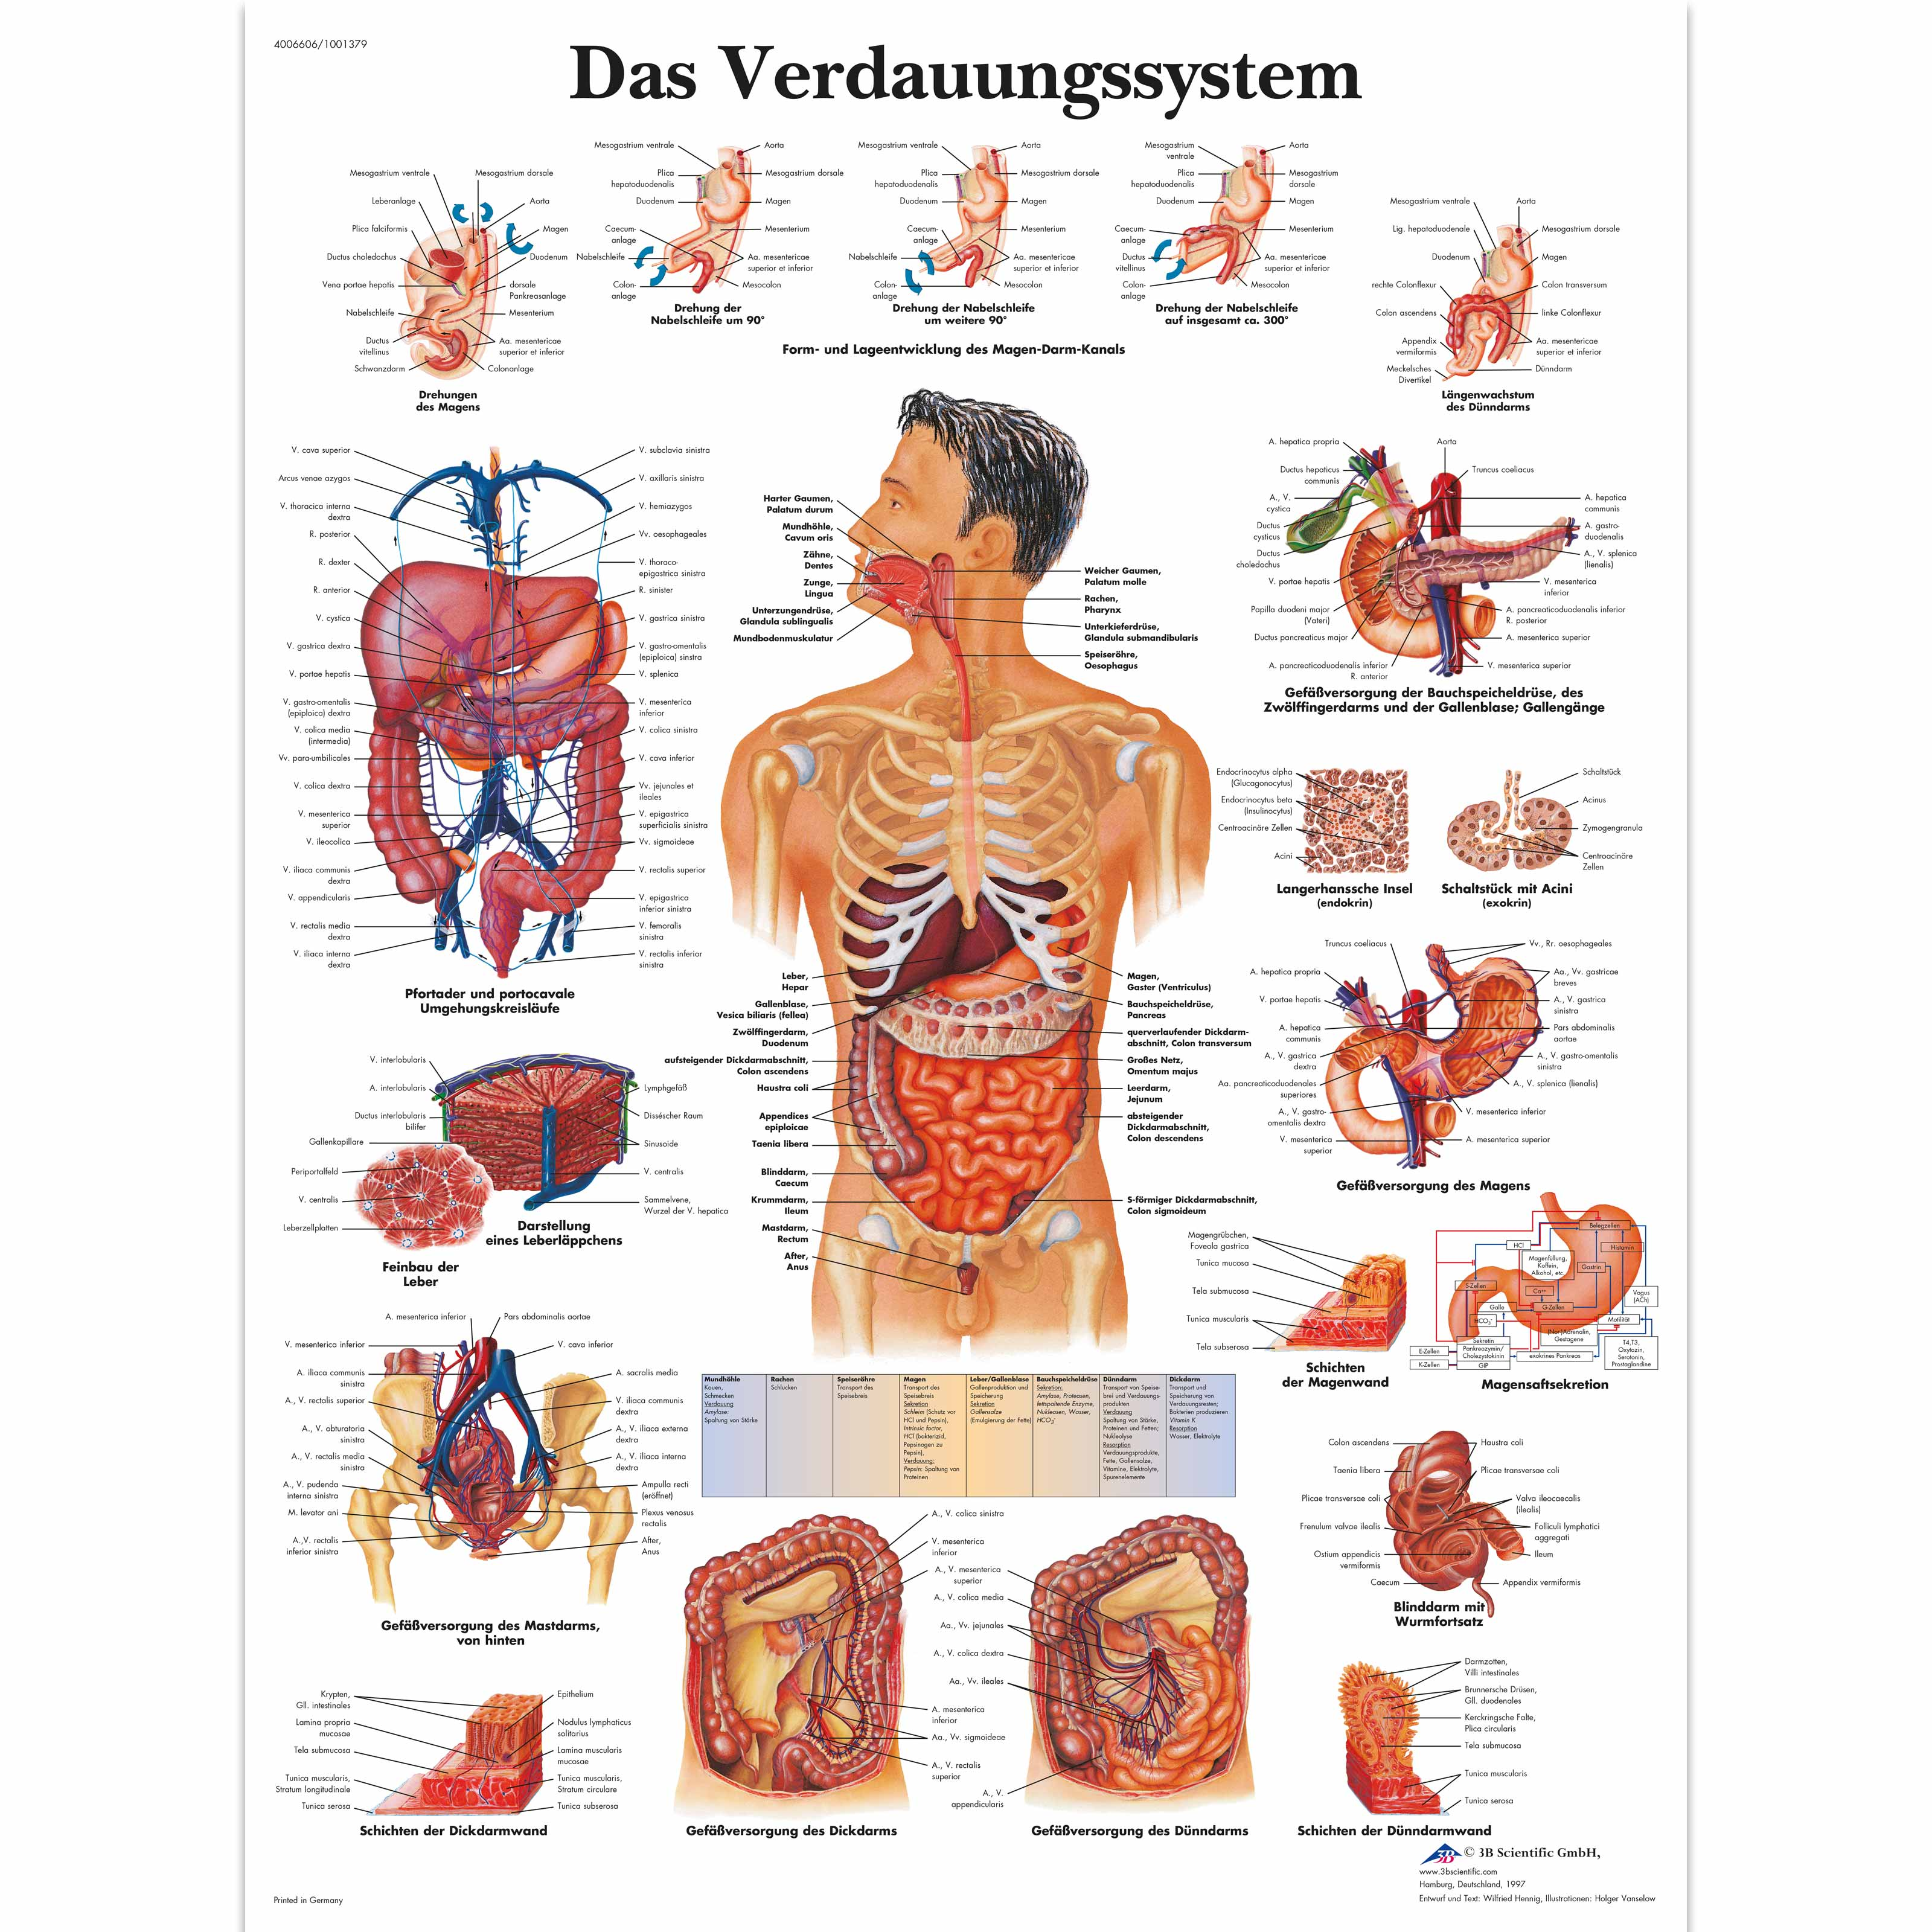 Das Verdauungssystem - 1001379 - VR0422L - Digestive System - 3B ...